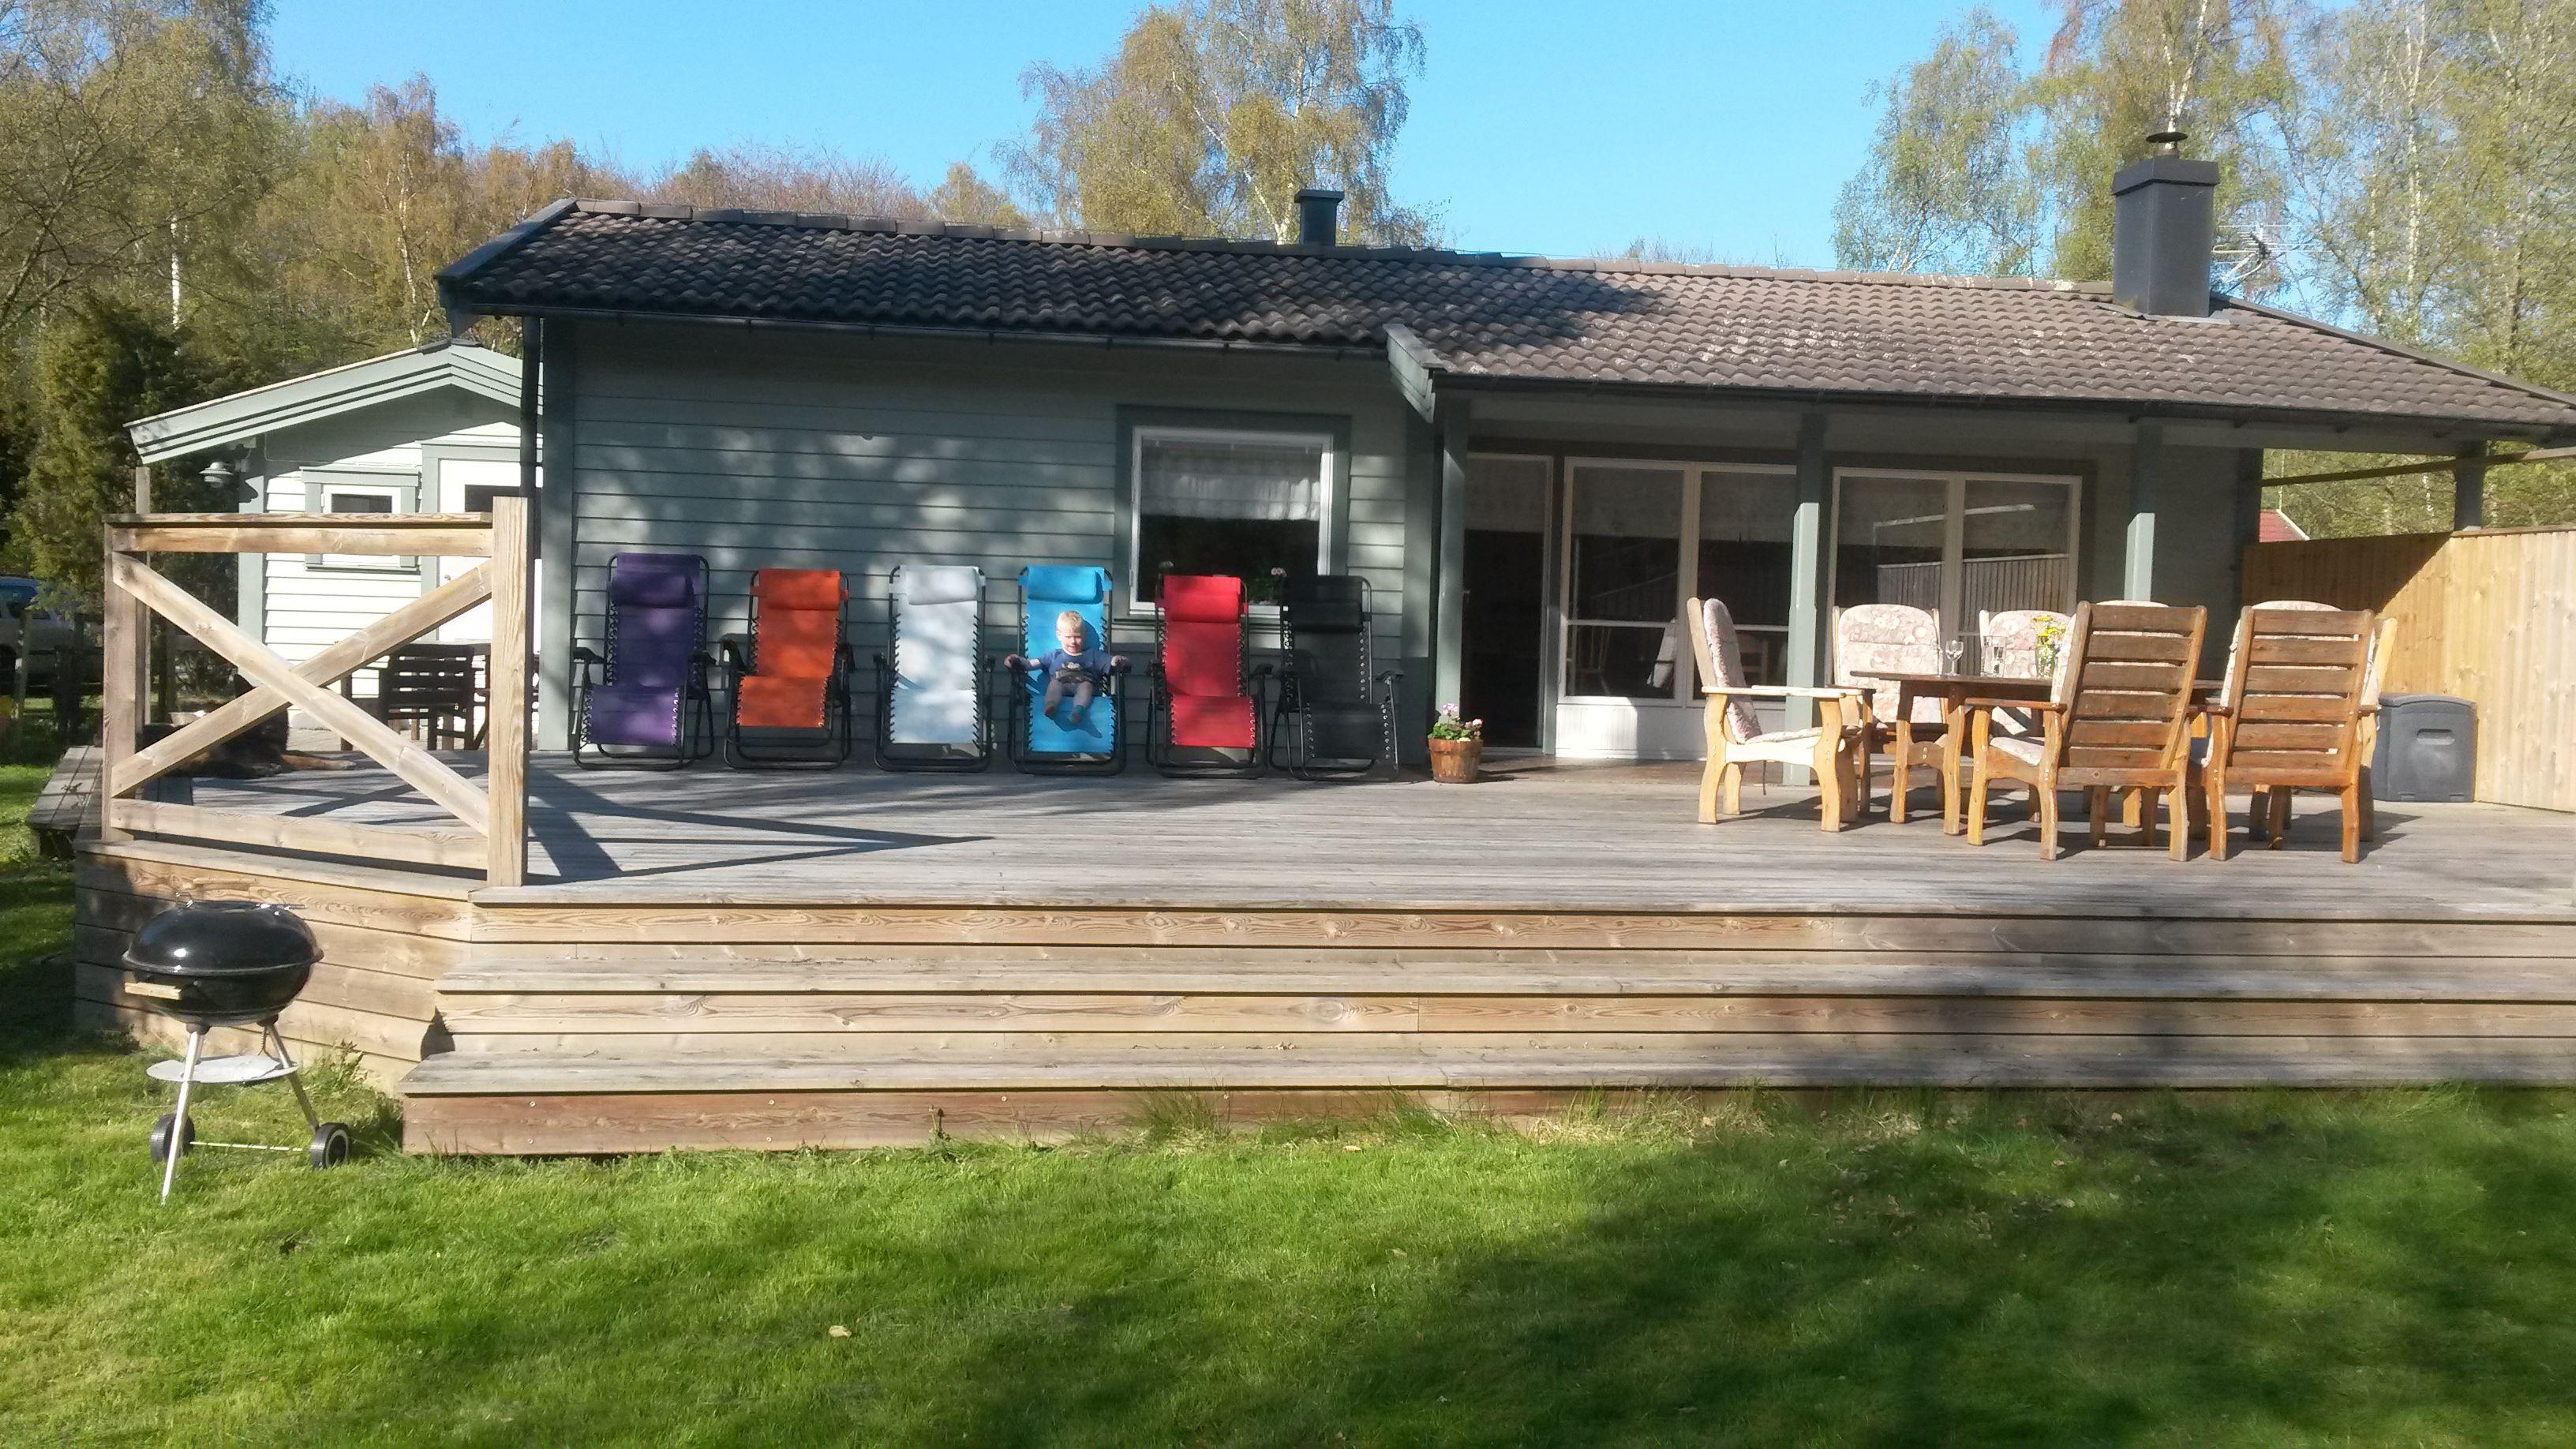 Ferienhaus mit 10 Betten - Grönslätt, Hällevik